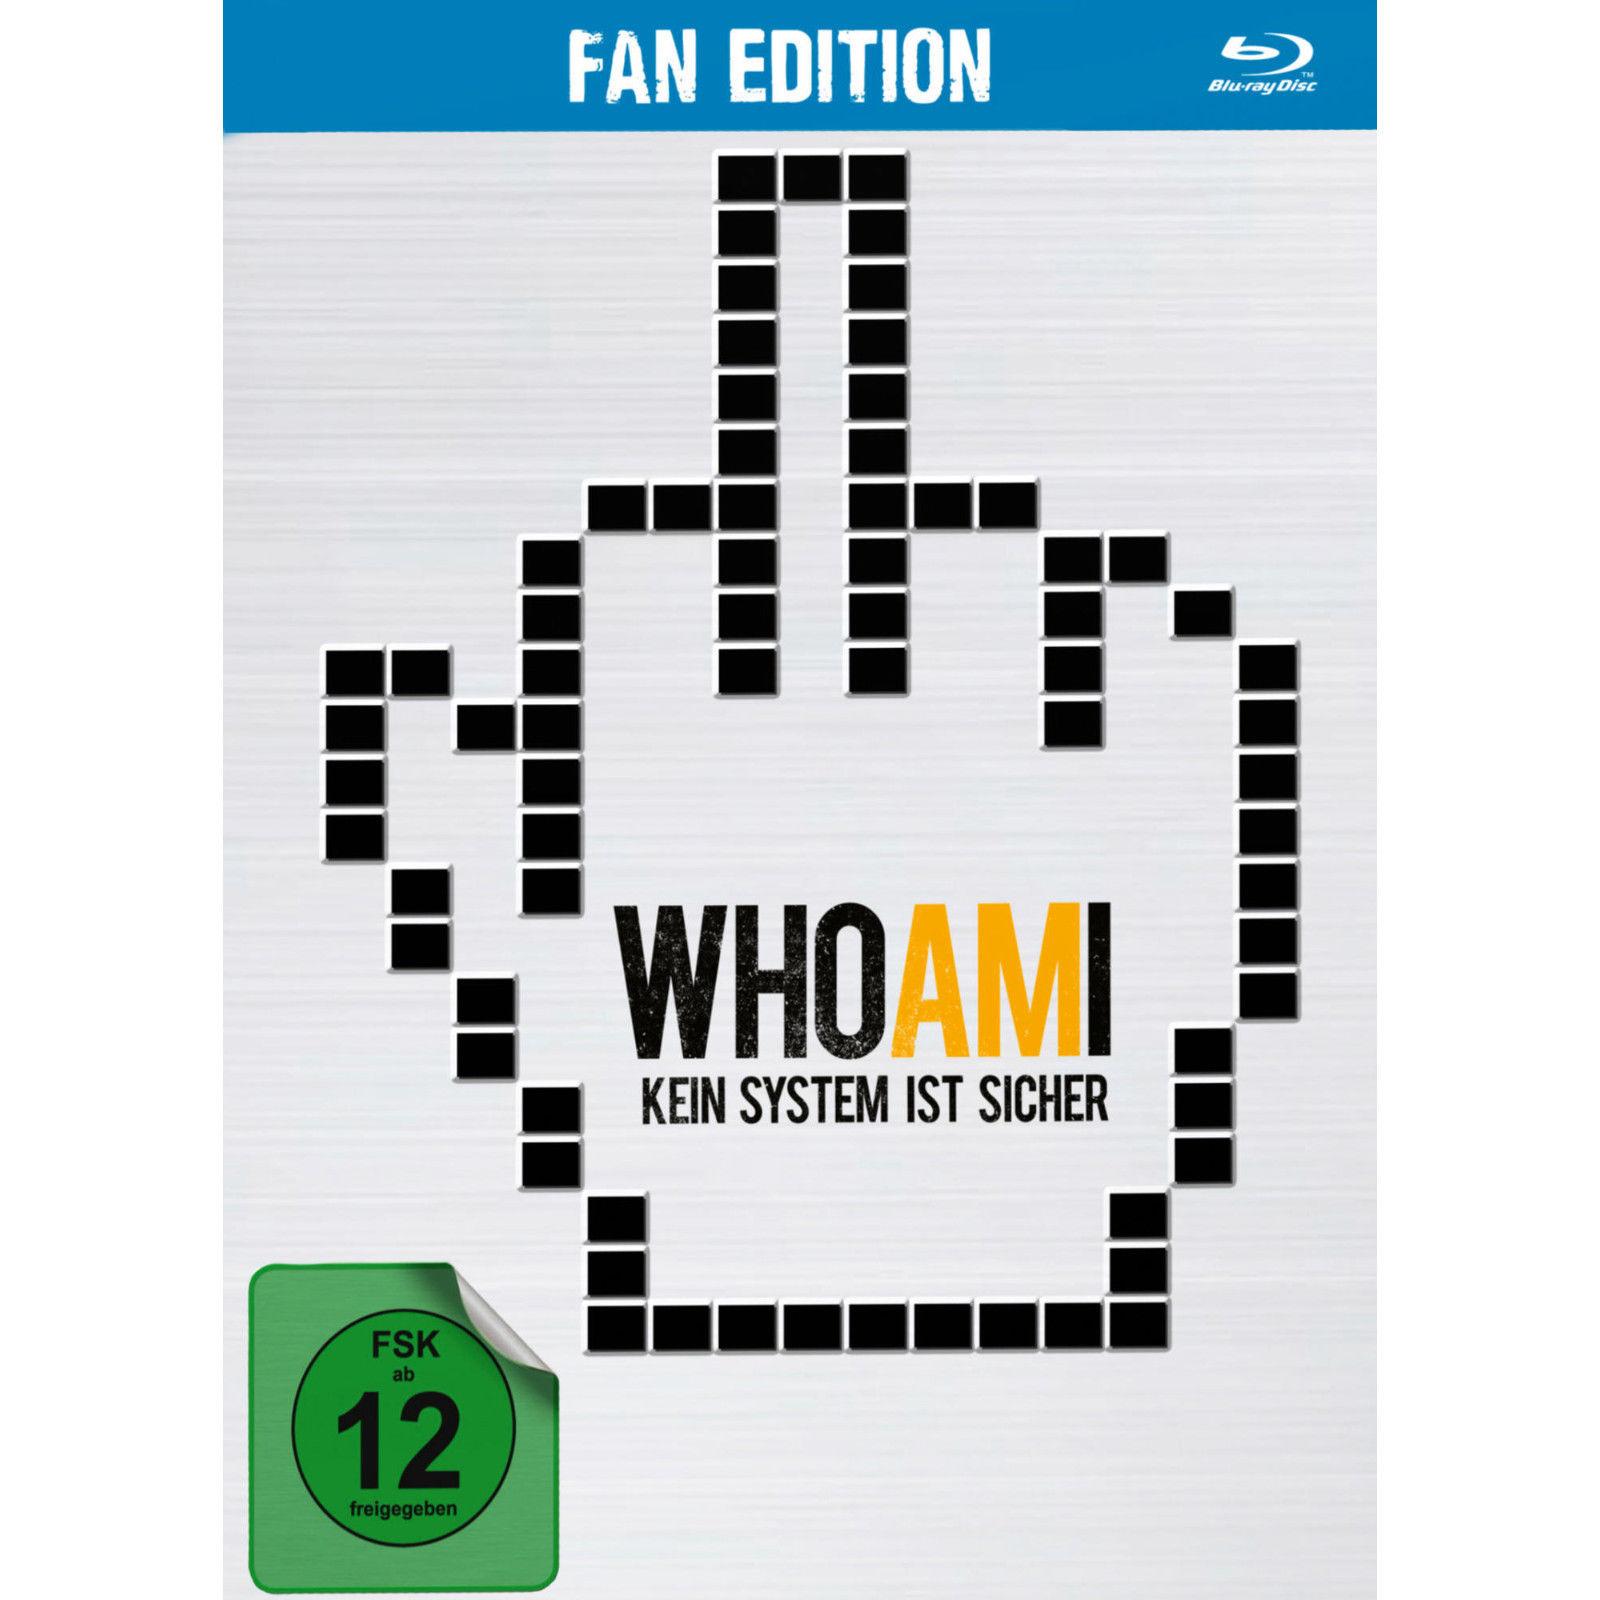 Who am I - Kein System ist sicher Limited Steelbook Edition (Blu-ray) & Easy Rider Limited Steelbook Edition (Blu-ray) & Hancock Extended Version Limited Steelbook Edition (Blu-ray + DVD) für je 7,99€ (Saturn)